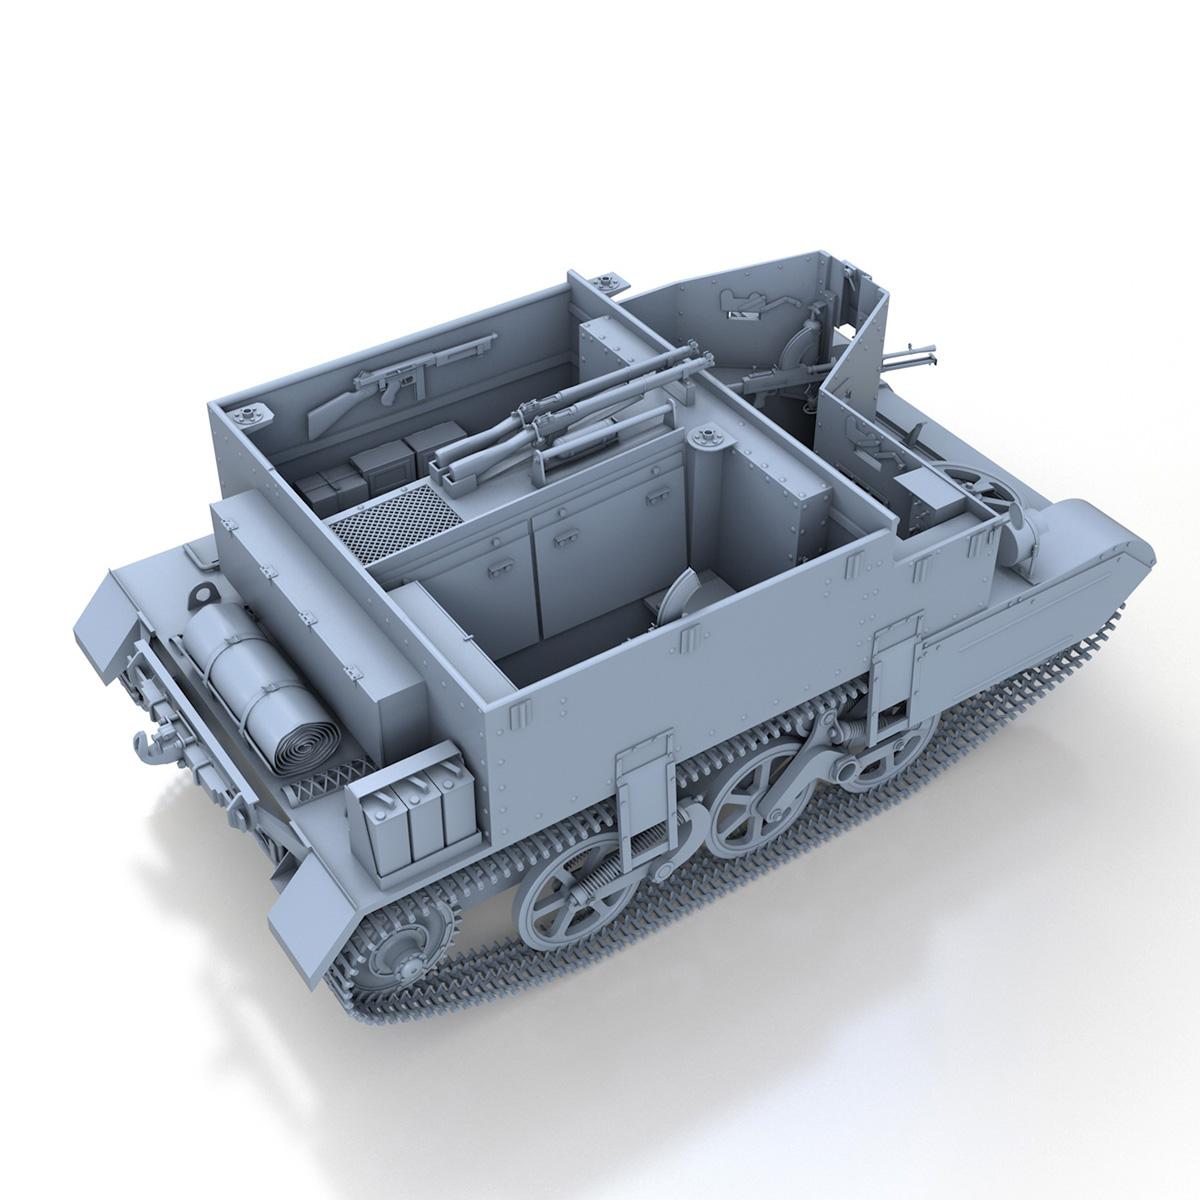 Universal Carrier MK II - Bren Gun Carrier 3d model 3ds fbx c4d lwo lws lw obj 272962